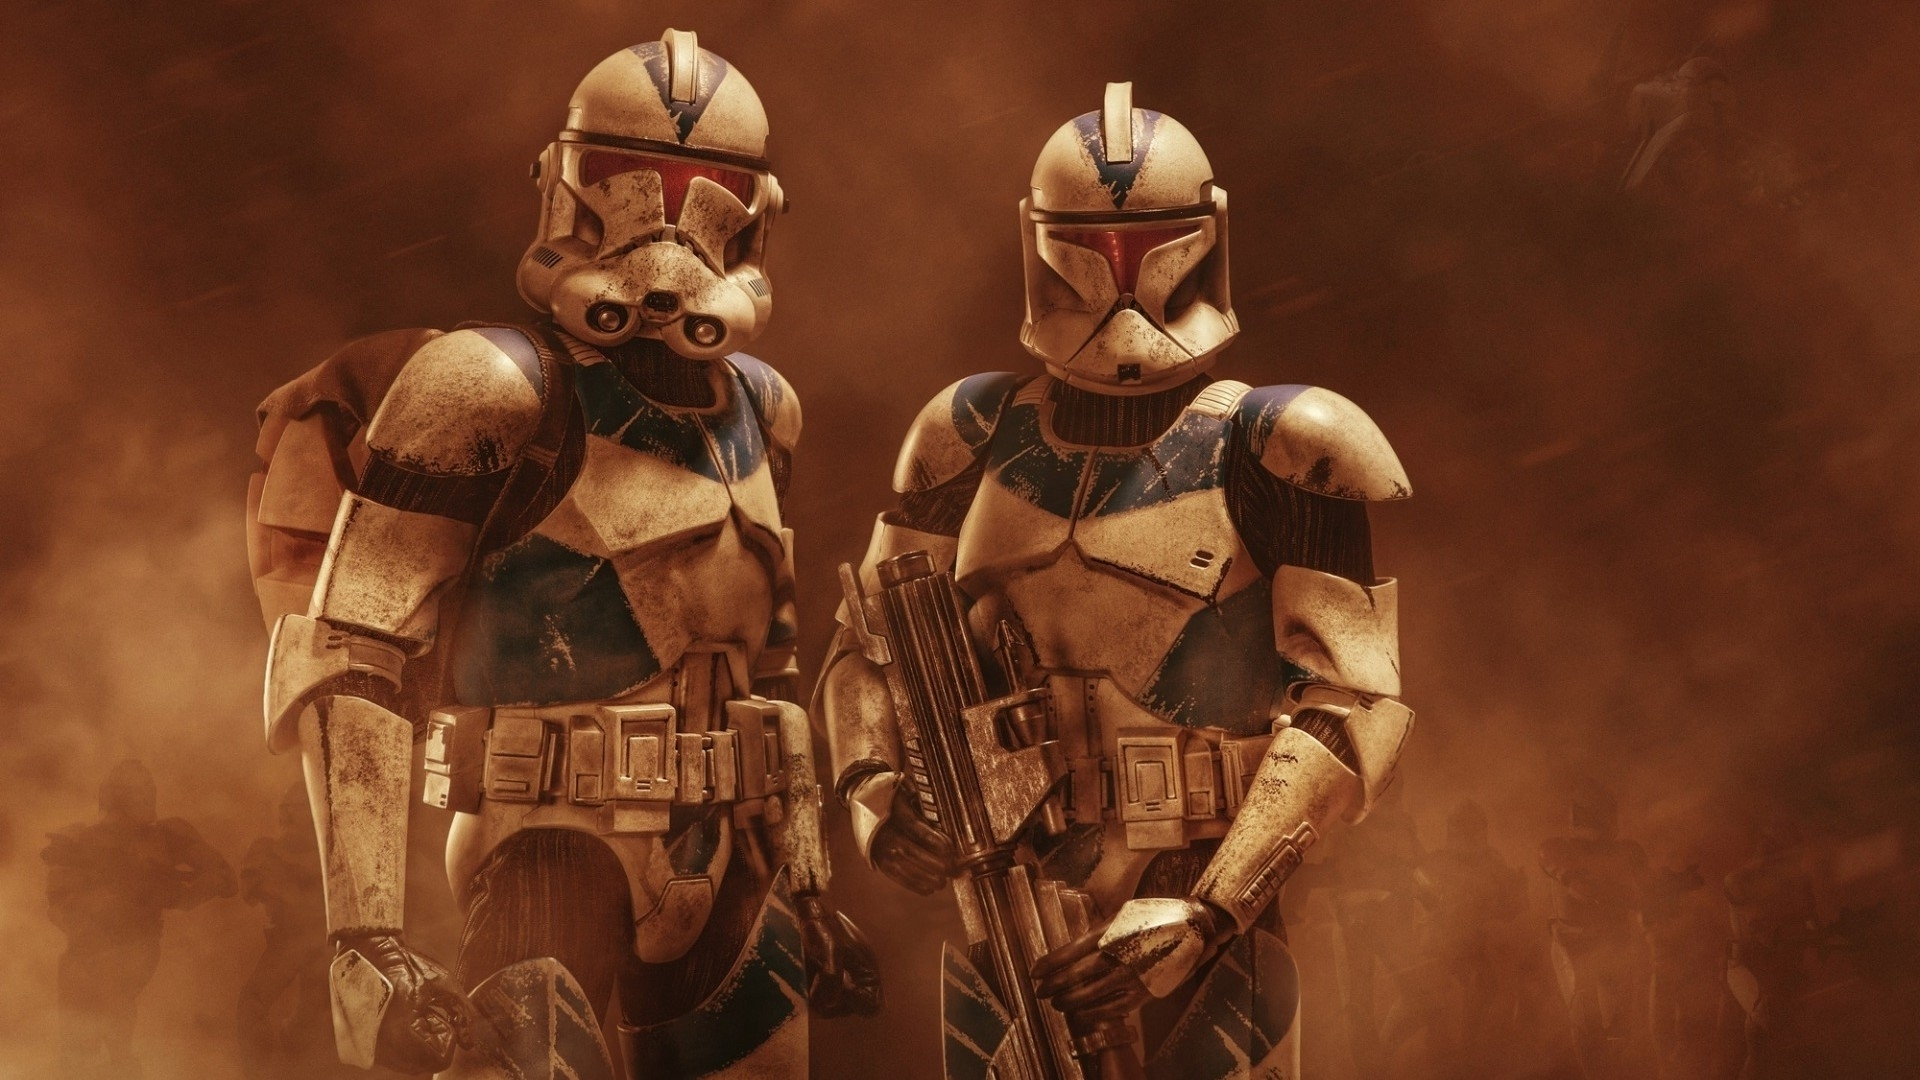 10 Best Star Wars Clone Trooper Wallpaper Full Hd 1080p For Pc